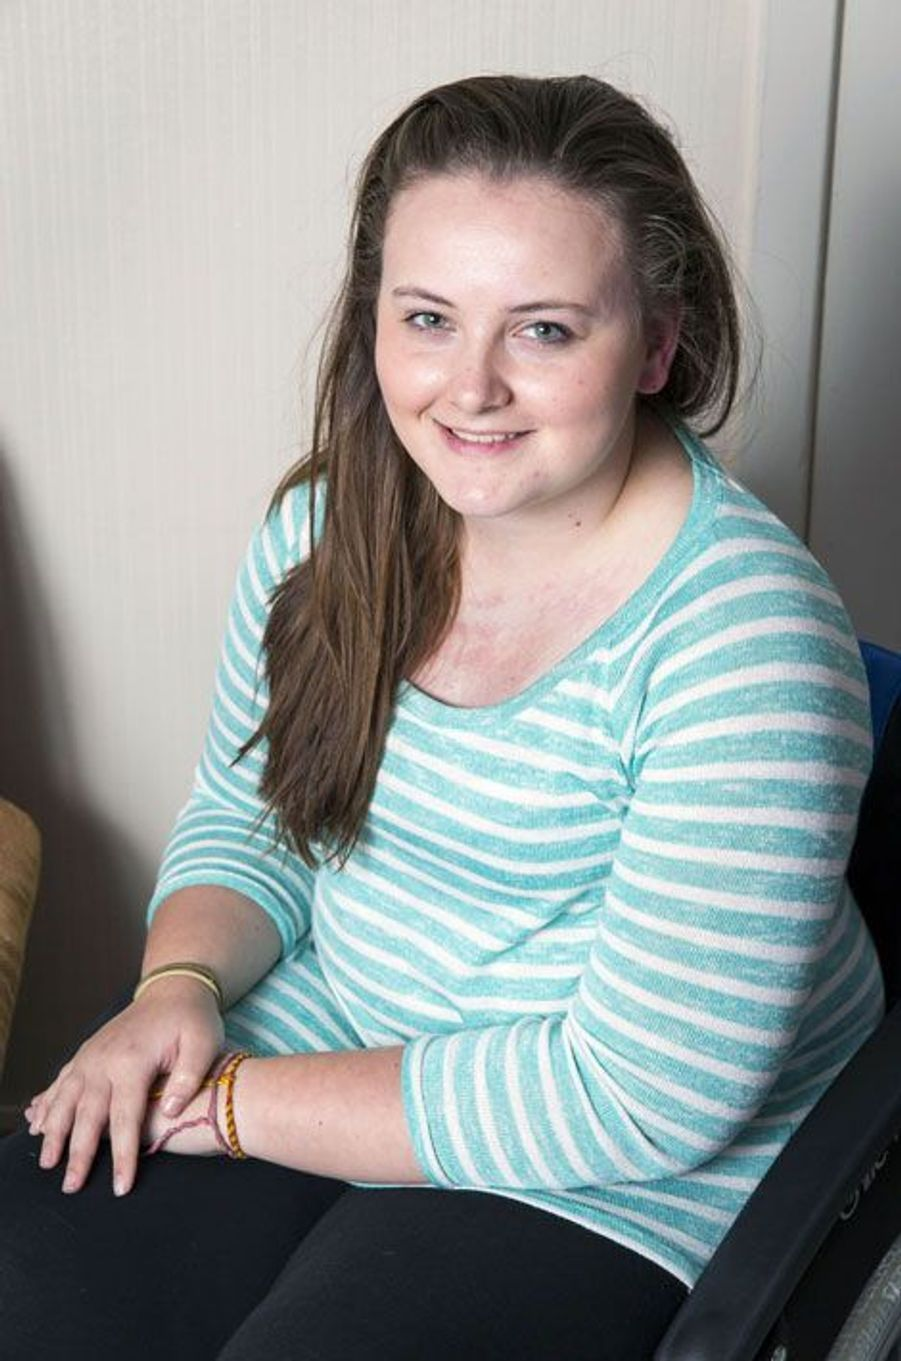 Jenny Gisby oublie sa vie toutes les semaines